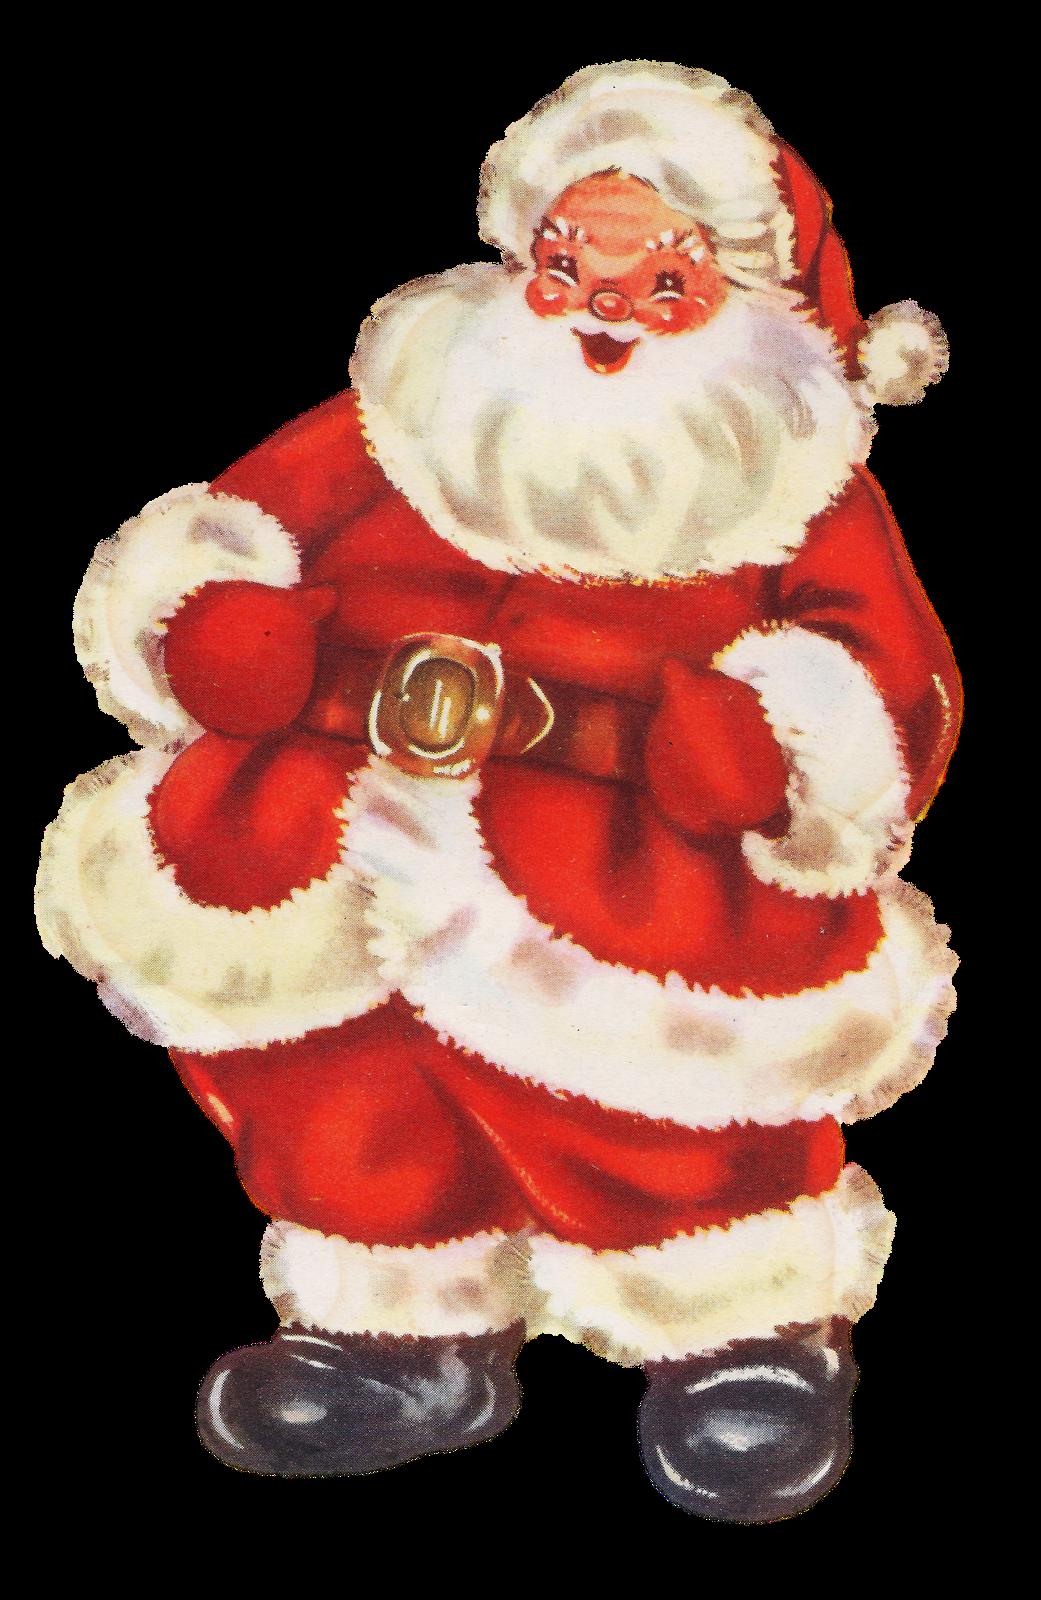 imagimeri 39 s swimming in ornaments vintage christmas. Black Bedroom Furniture Sets. Home Design Ideas